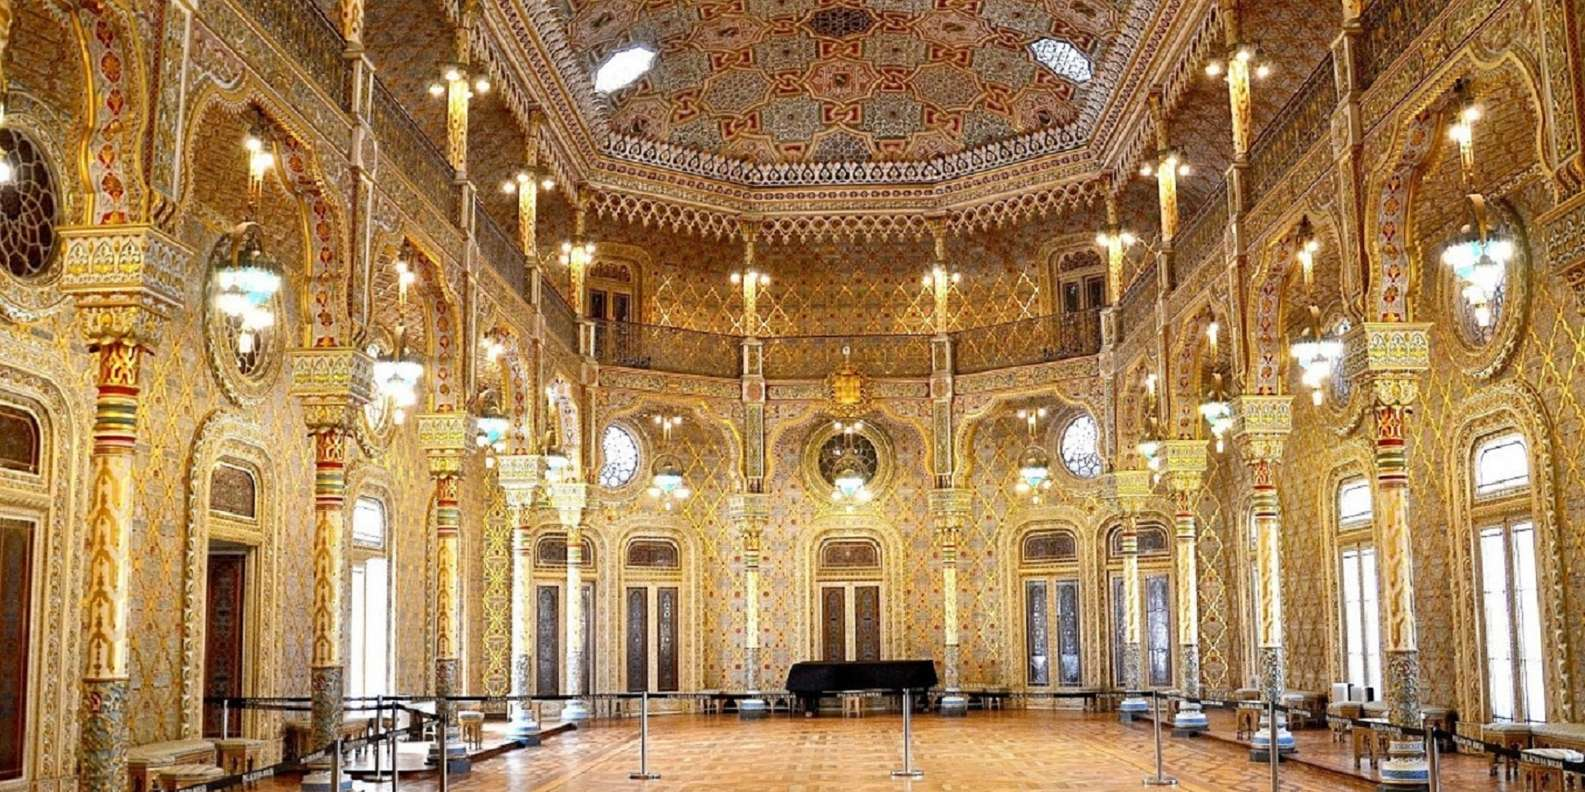 World Heritage Center of Porto